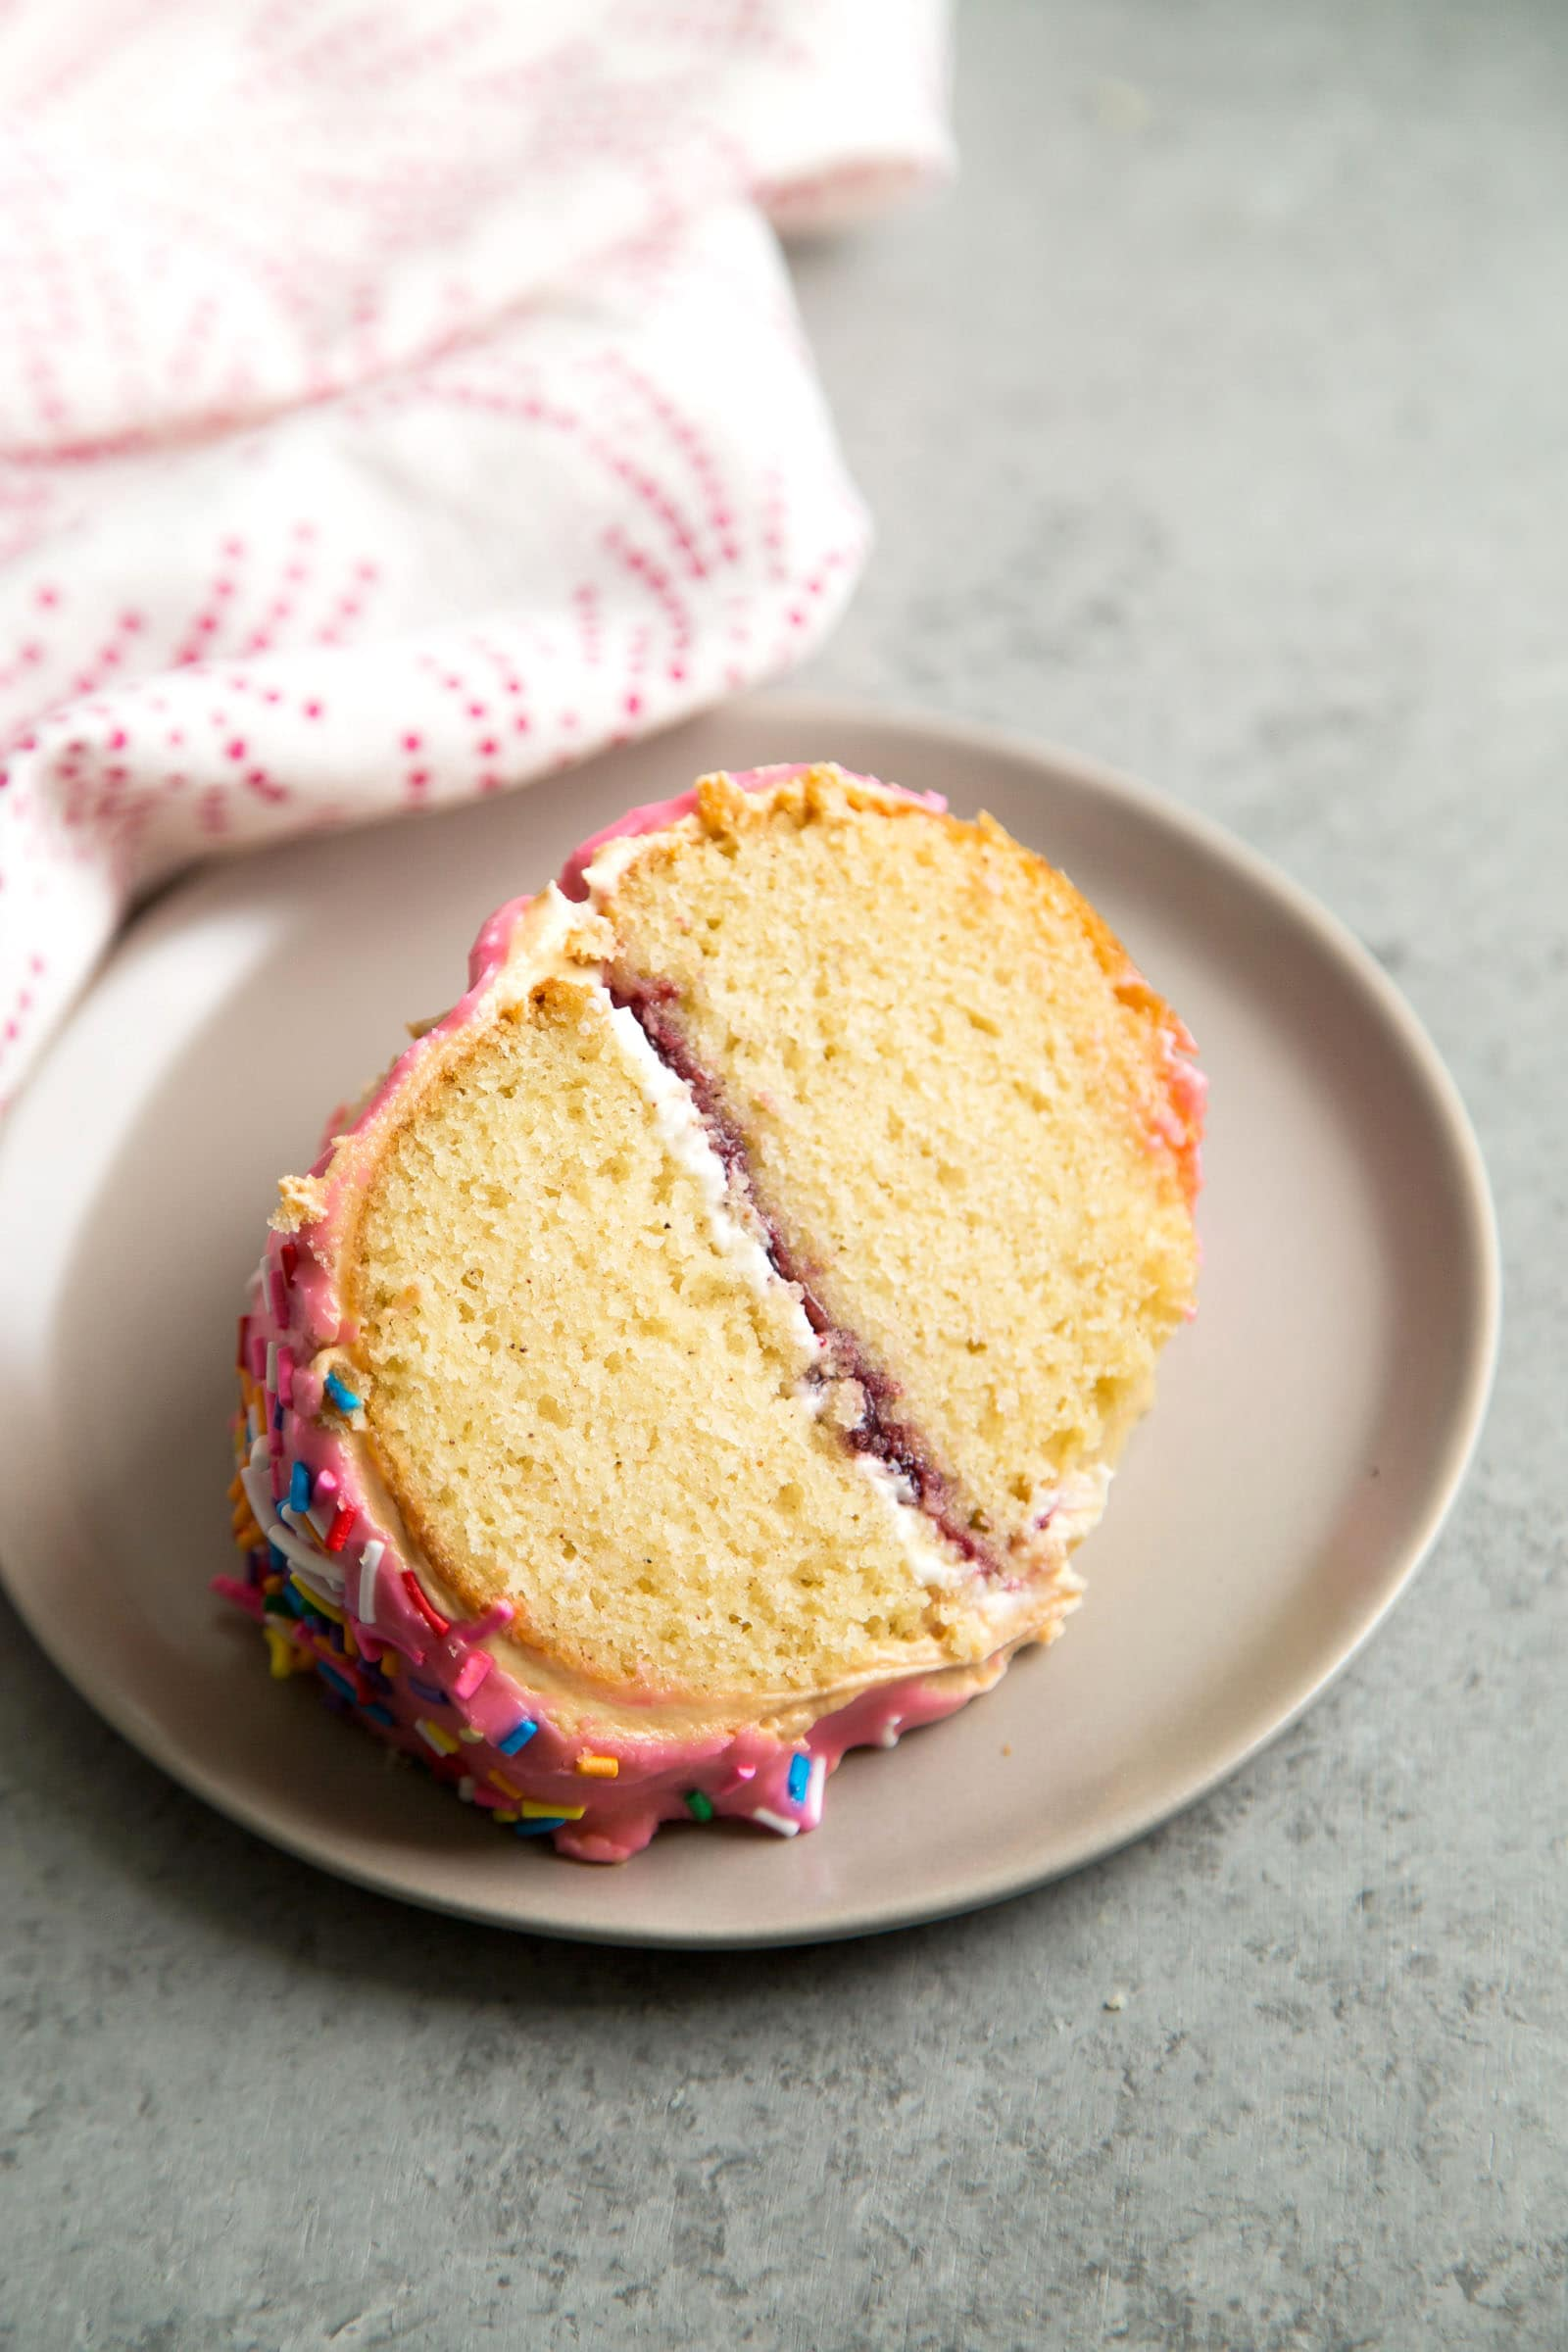 Giant Donut Cake with sprinkles